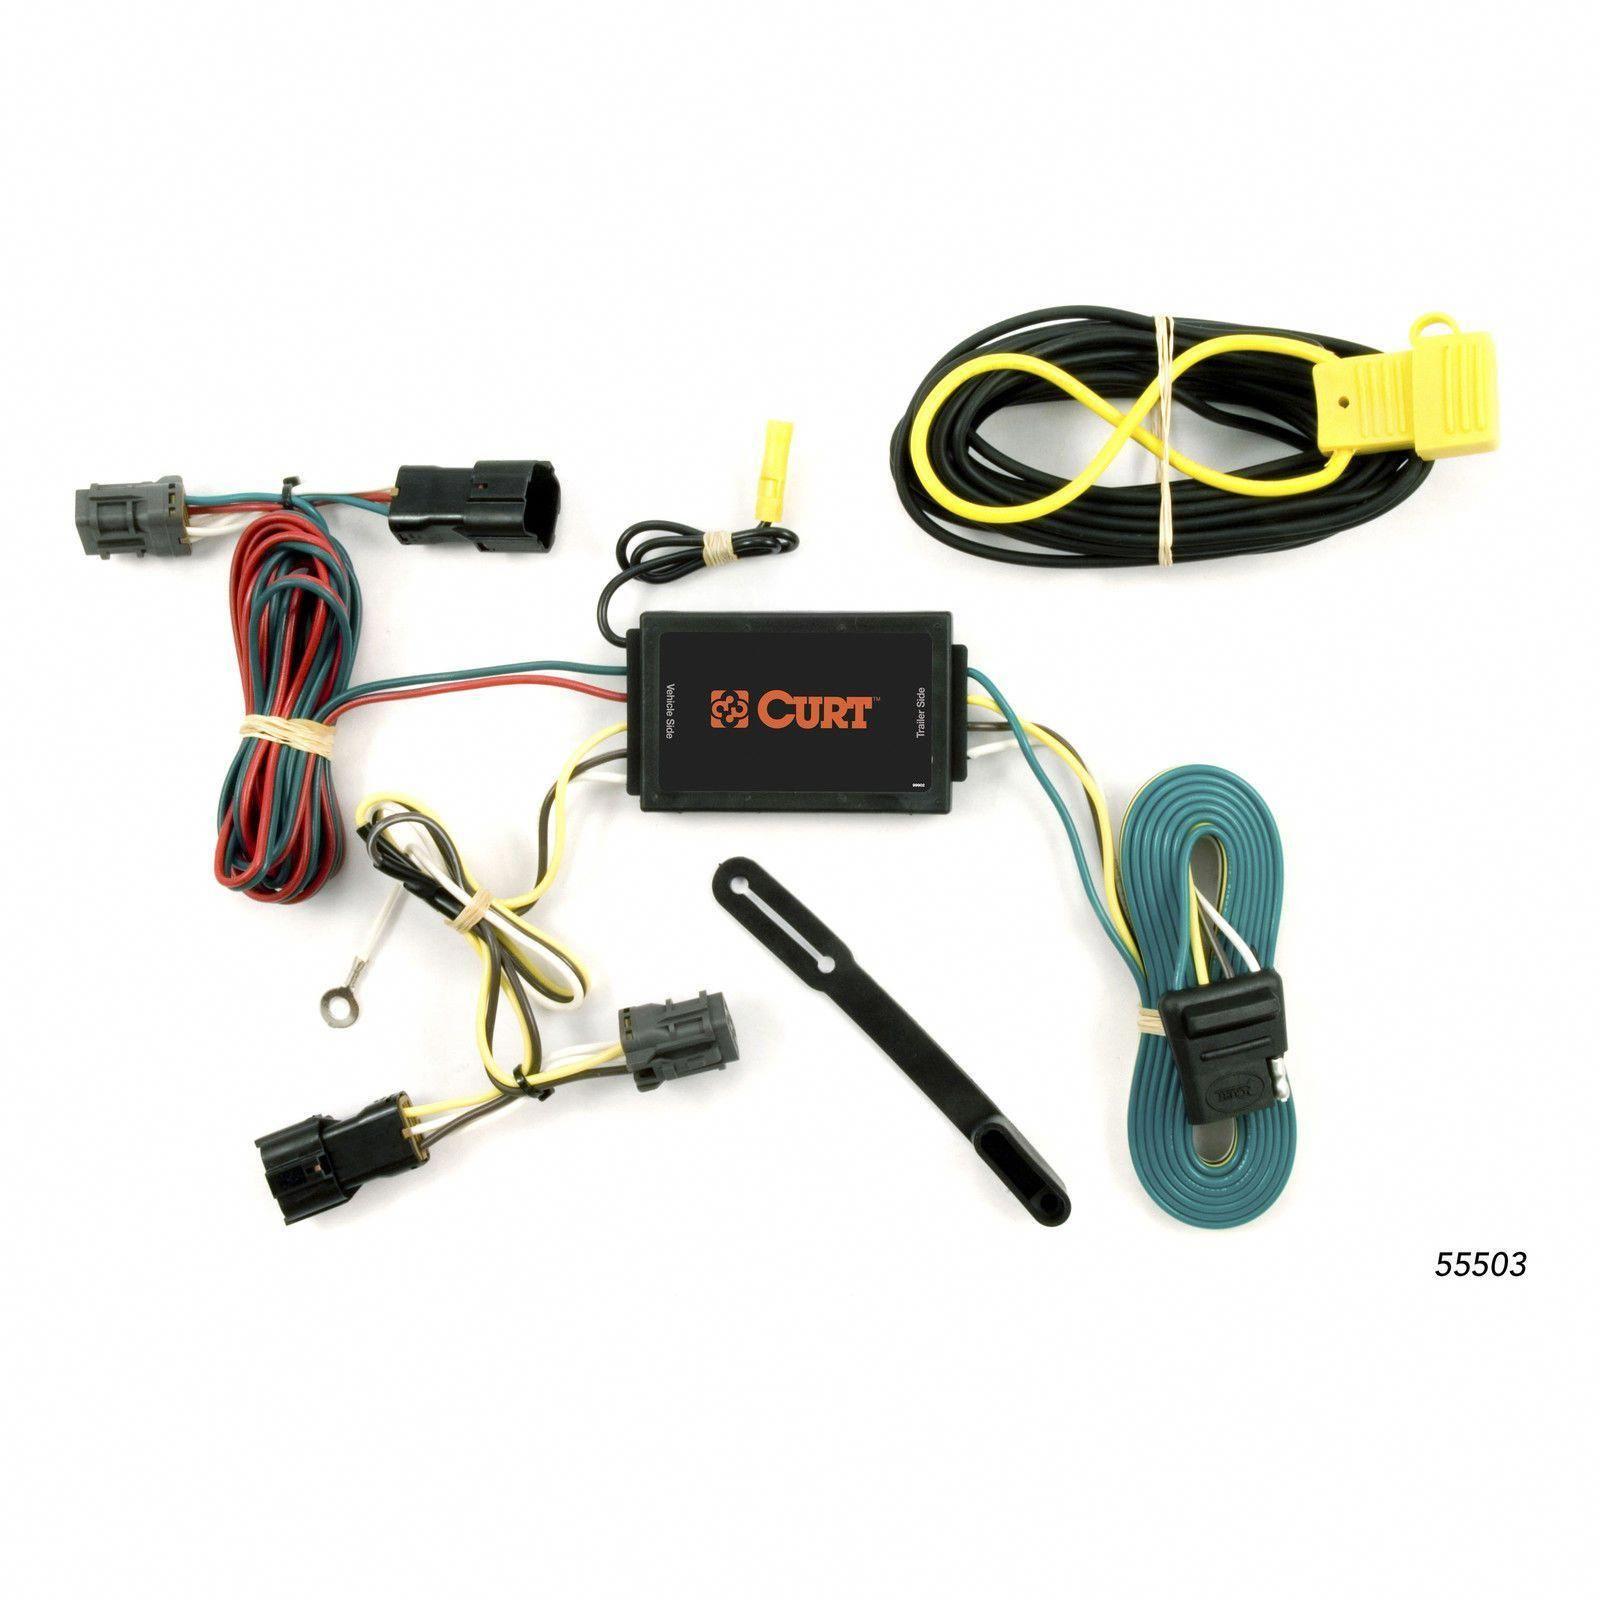 hight resolution of curt 55503 wiring harness for 07 09 hyundai entourage 06 14 kia sedona kiasedona